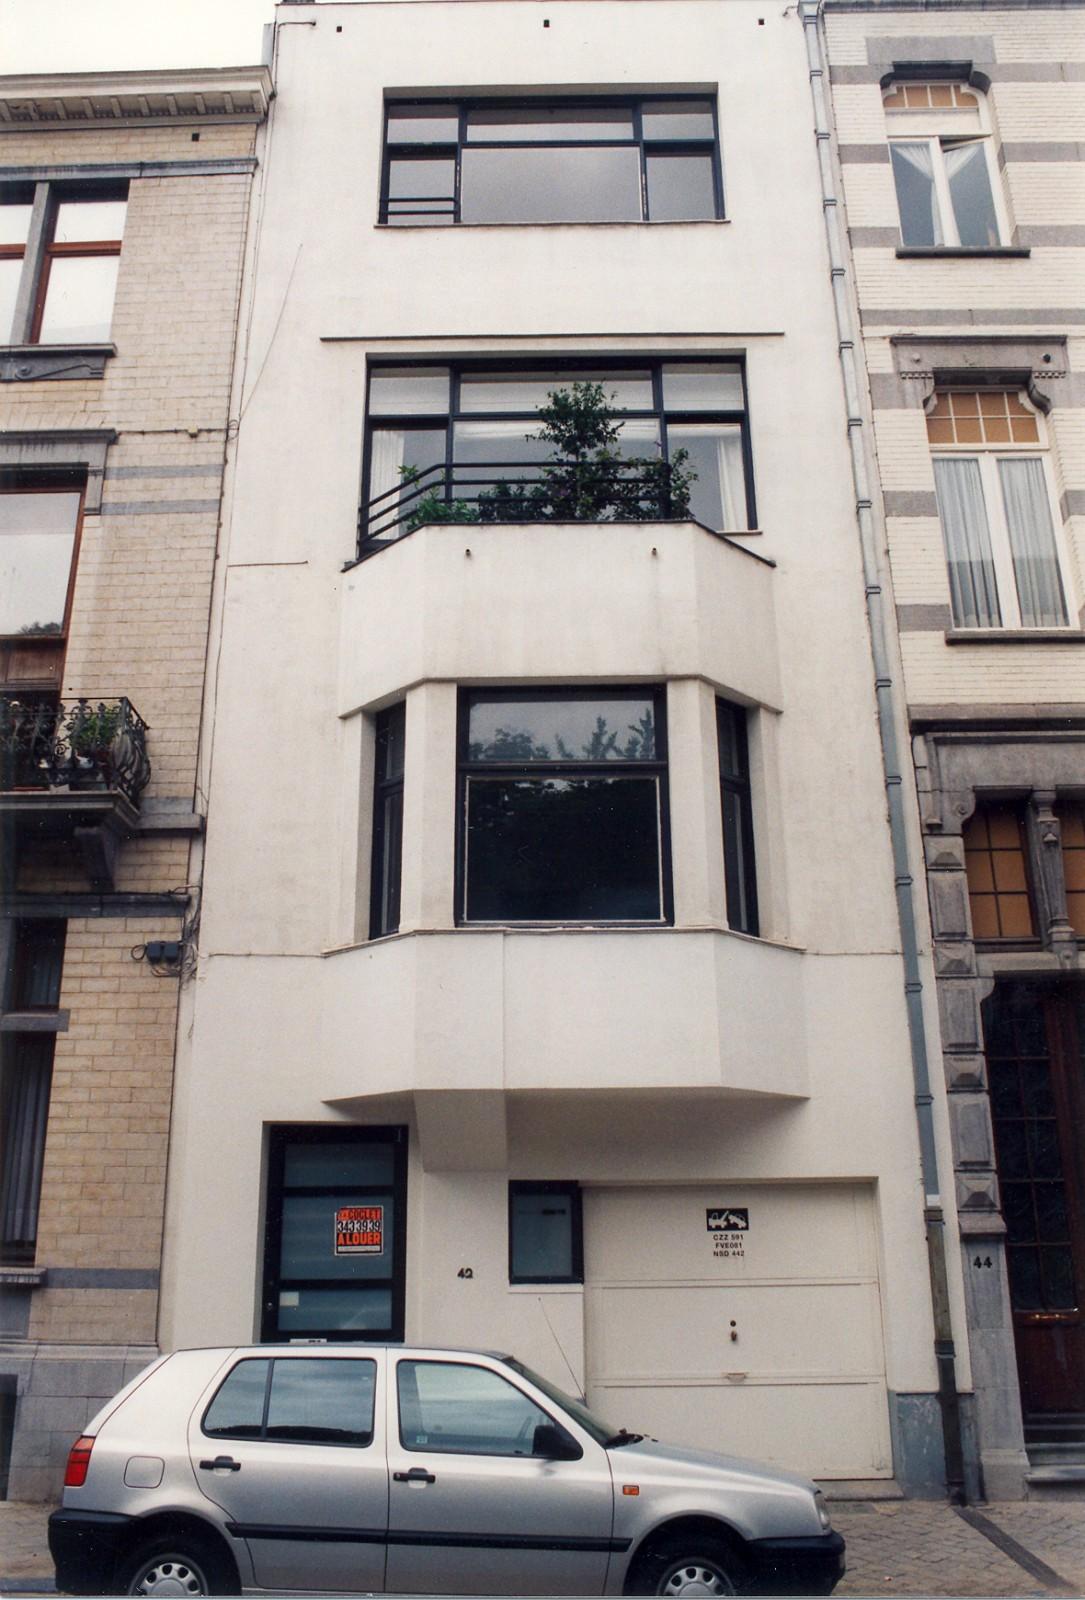 Rue Africaine 42., 1996